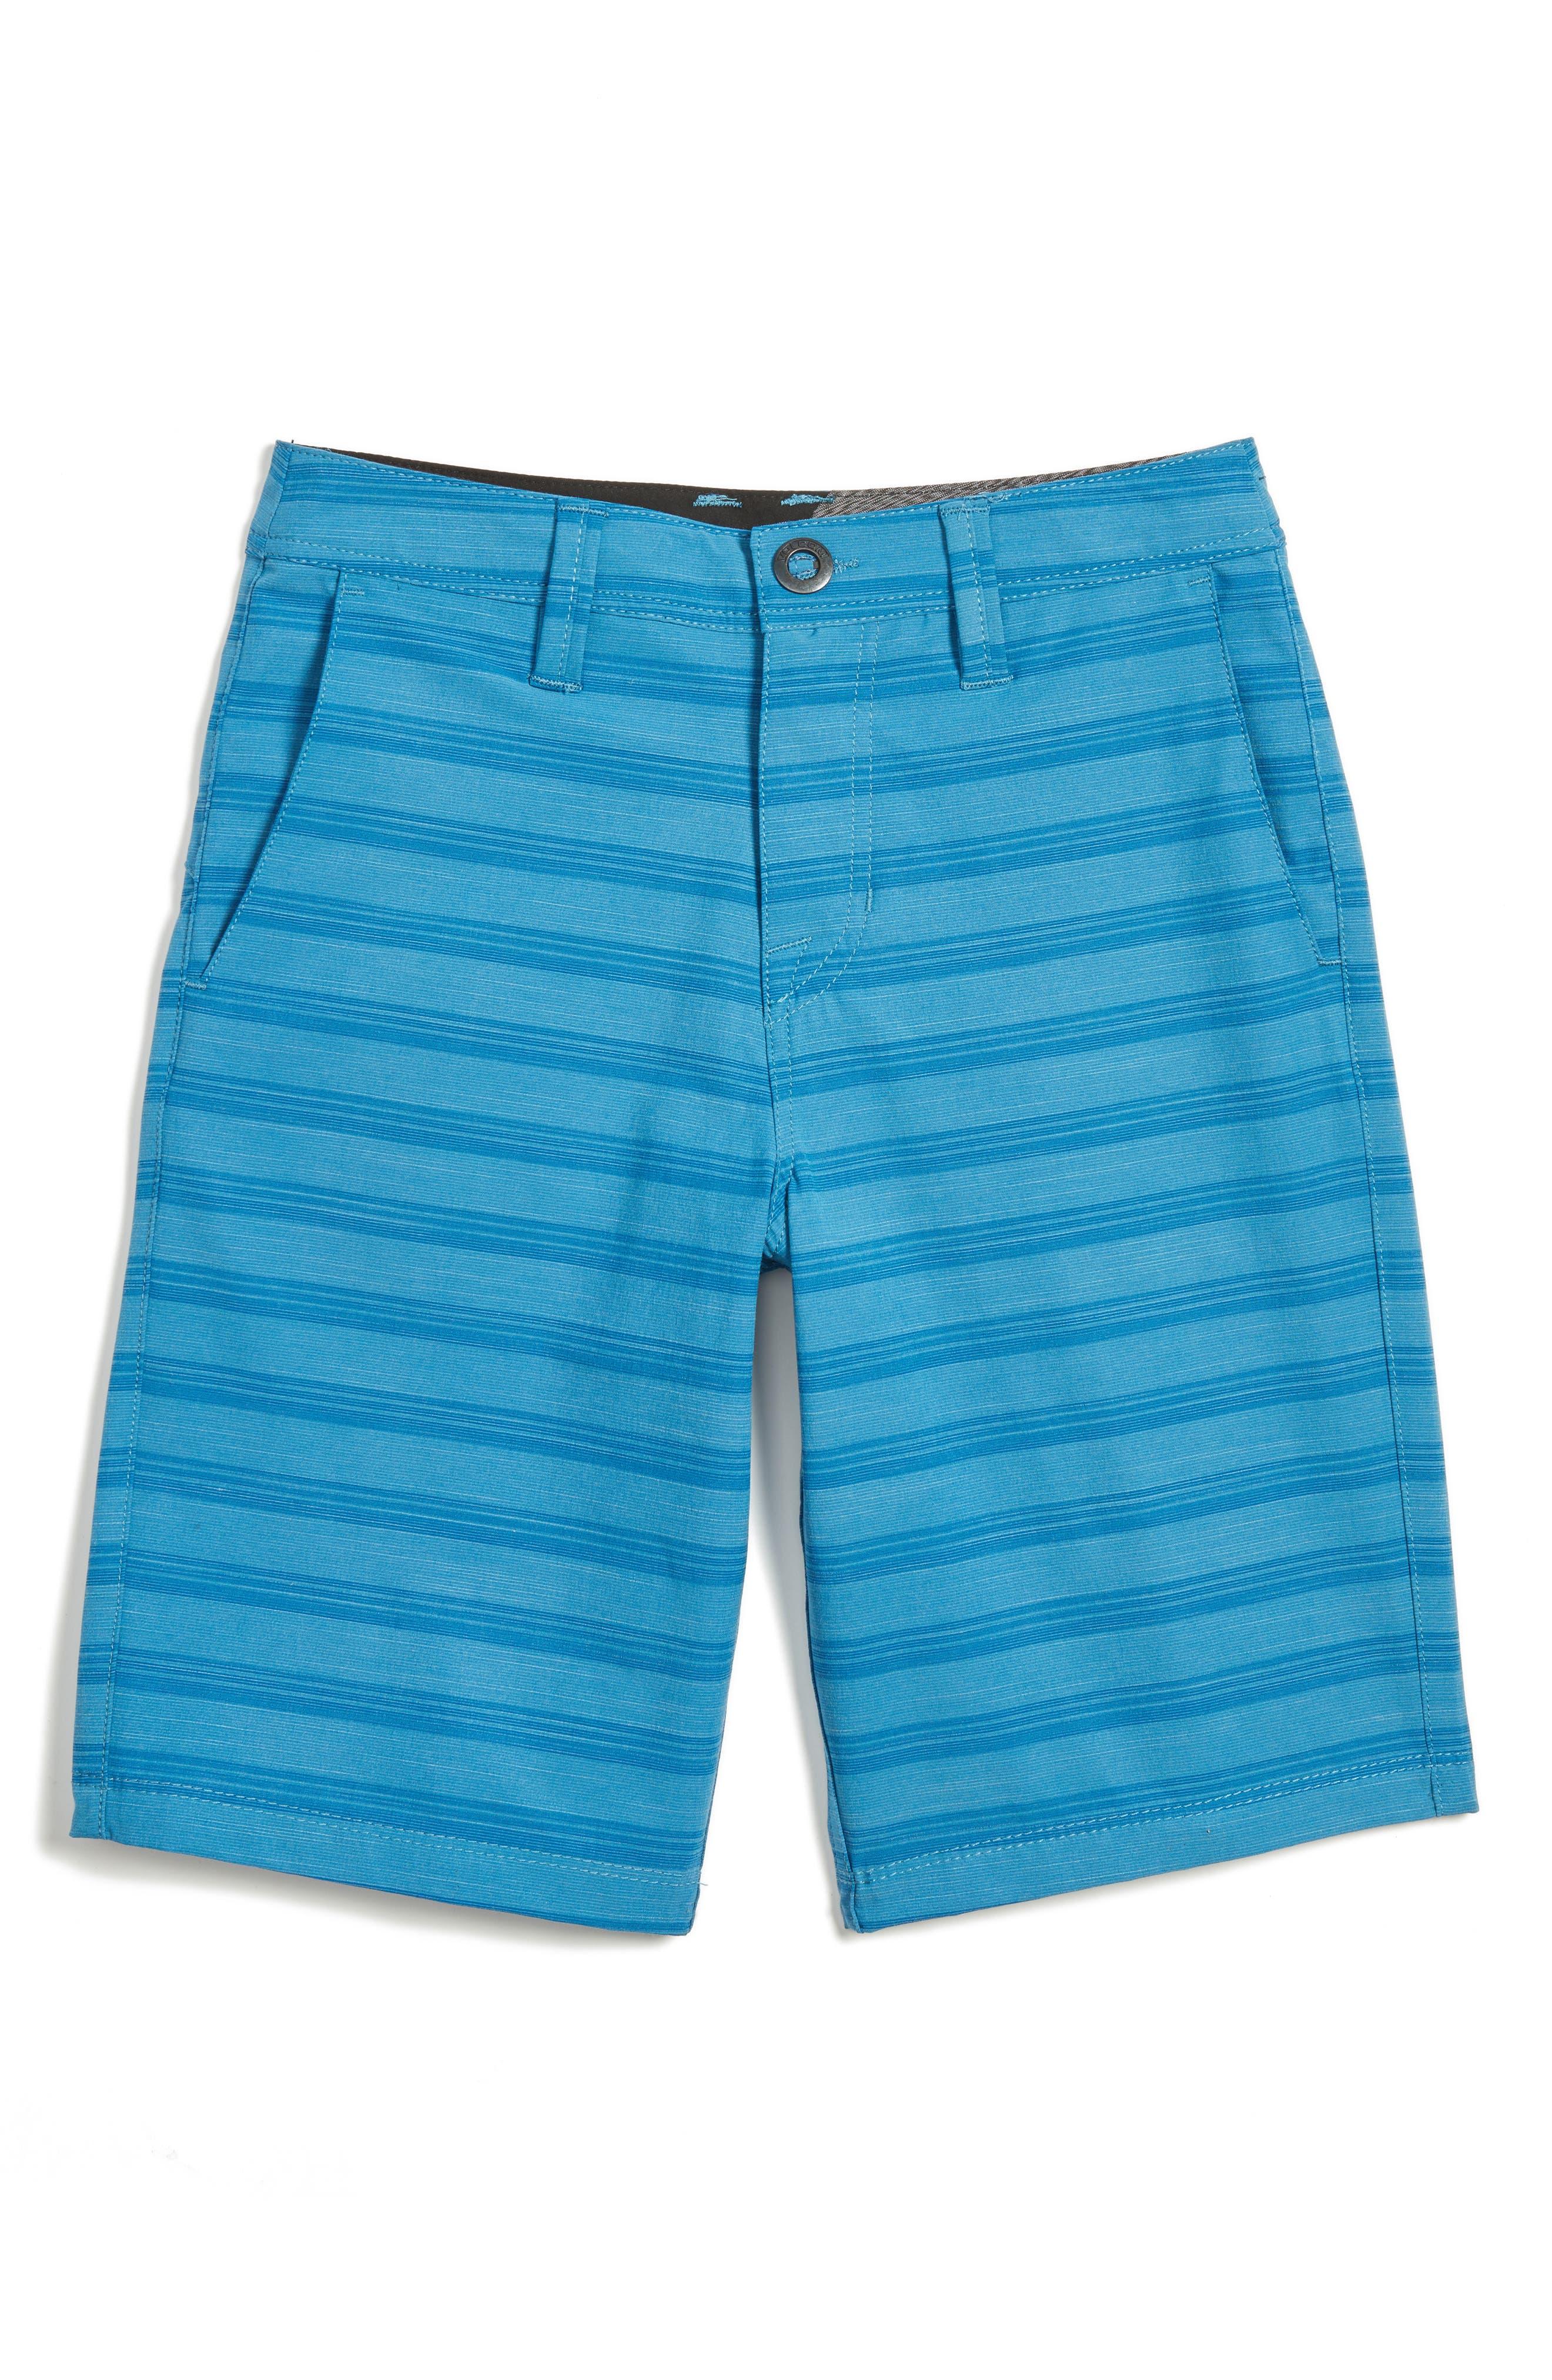 Volcom Surf N' Turf Hybrid Shorts (Big Boys)